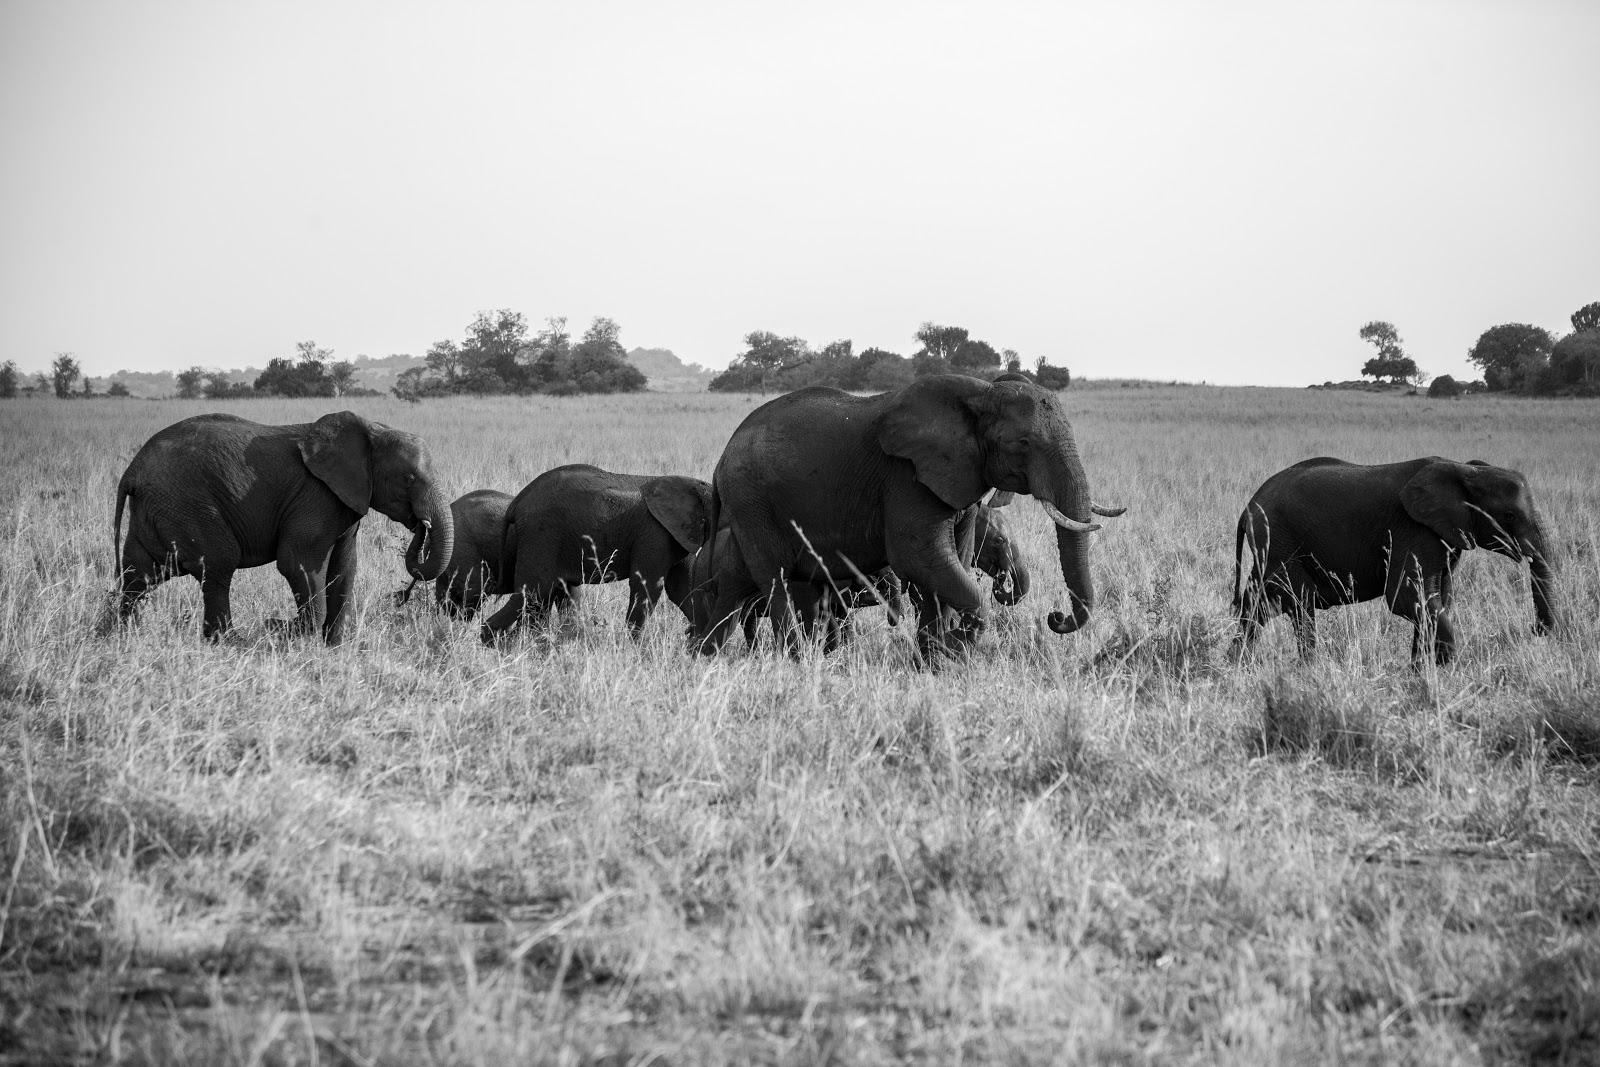 image of a small herd of elephants walking